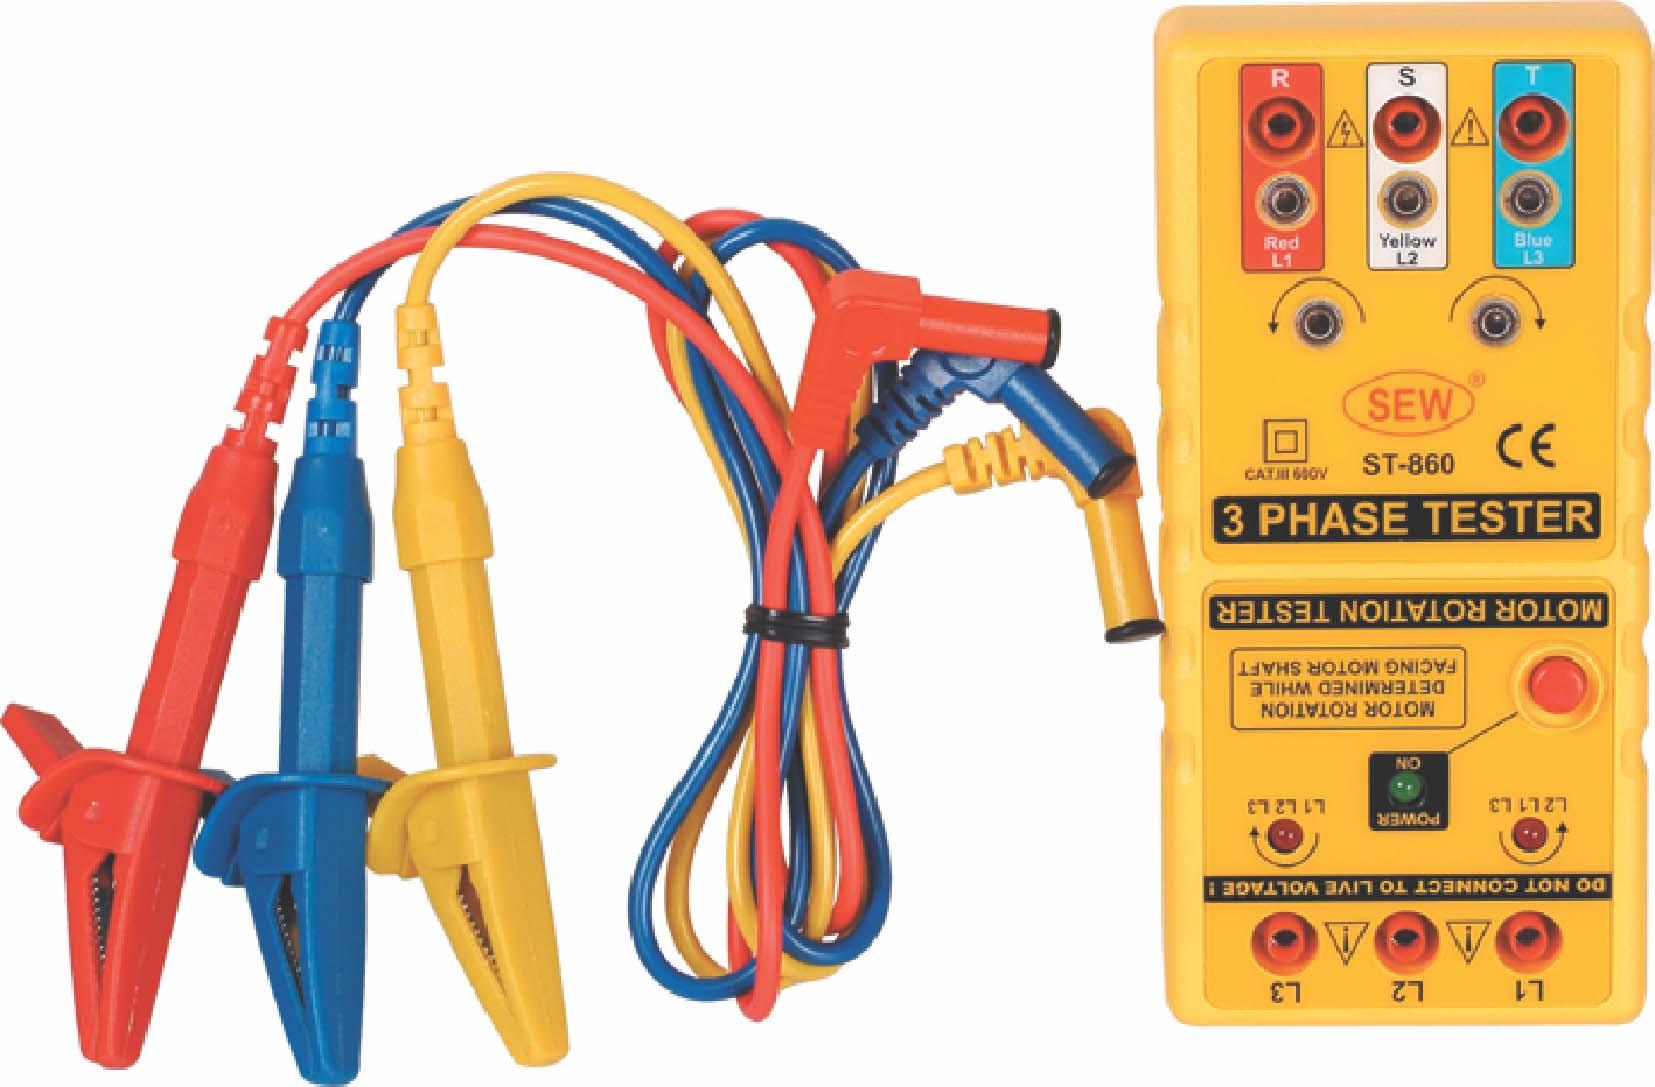 st-850相序表测量三相电源